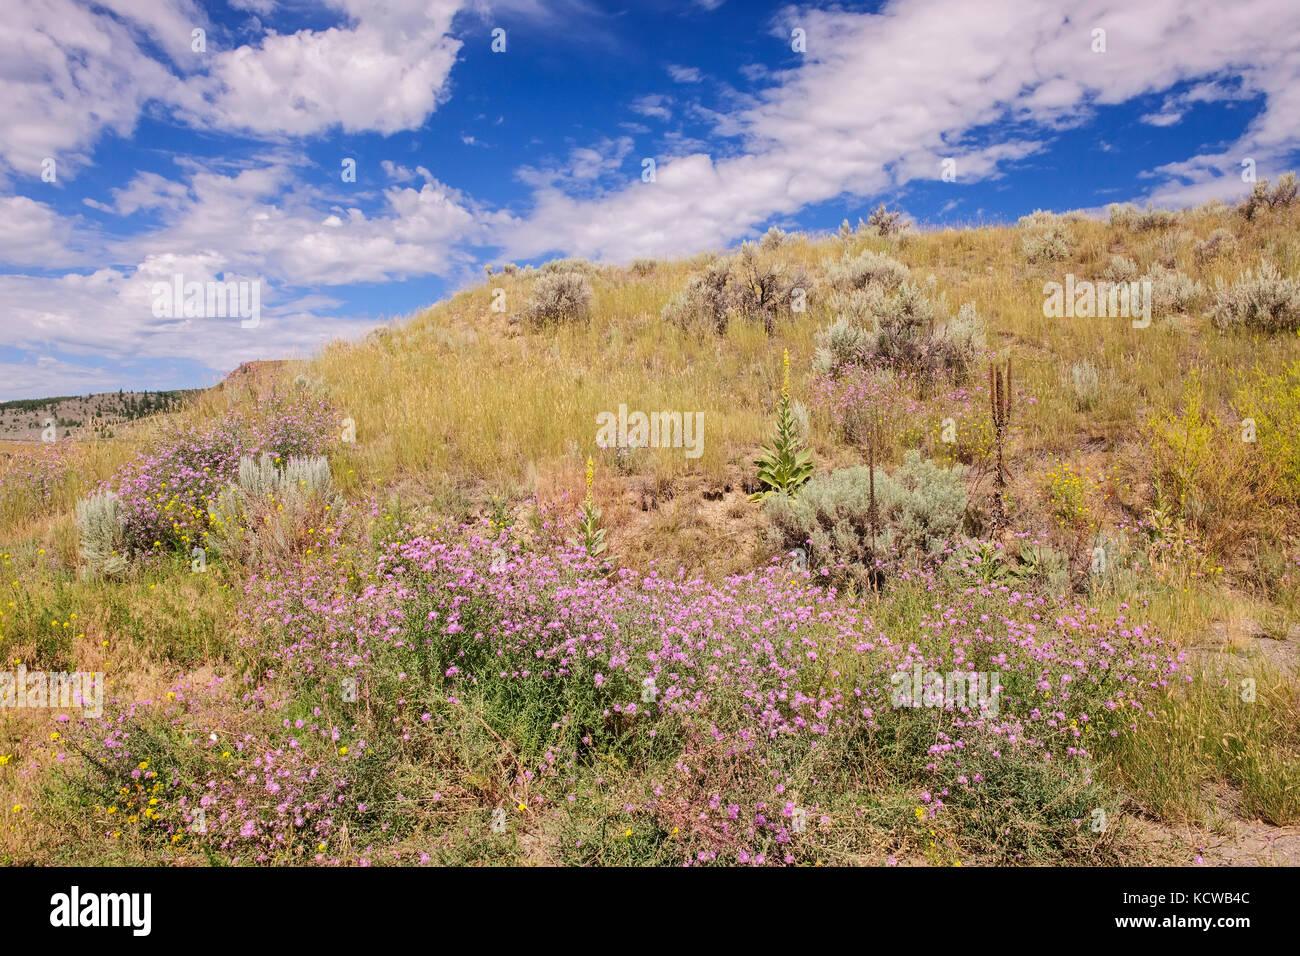 Grasslands ecosystem, Kamloops, British Columbia, Canada - Stock Image